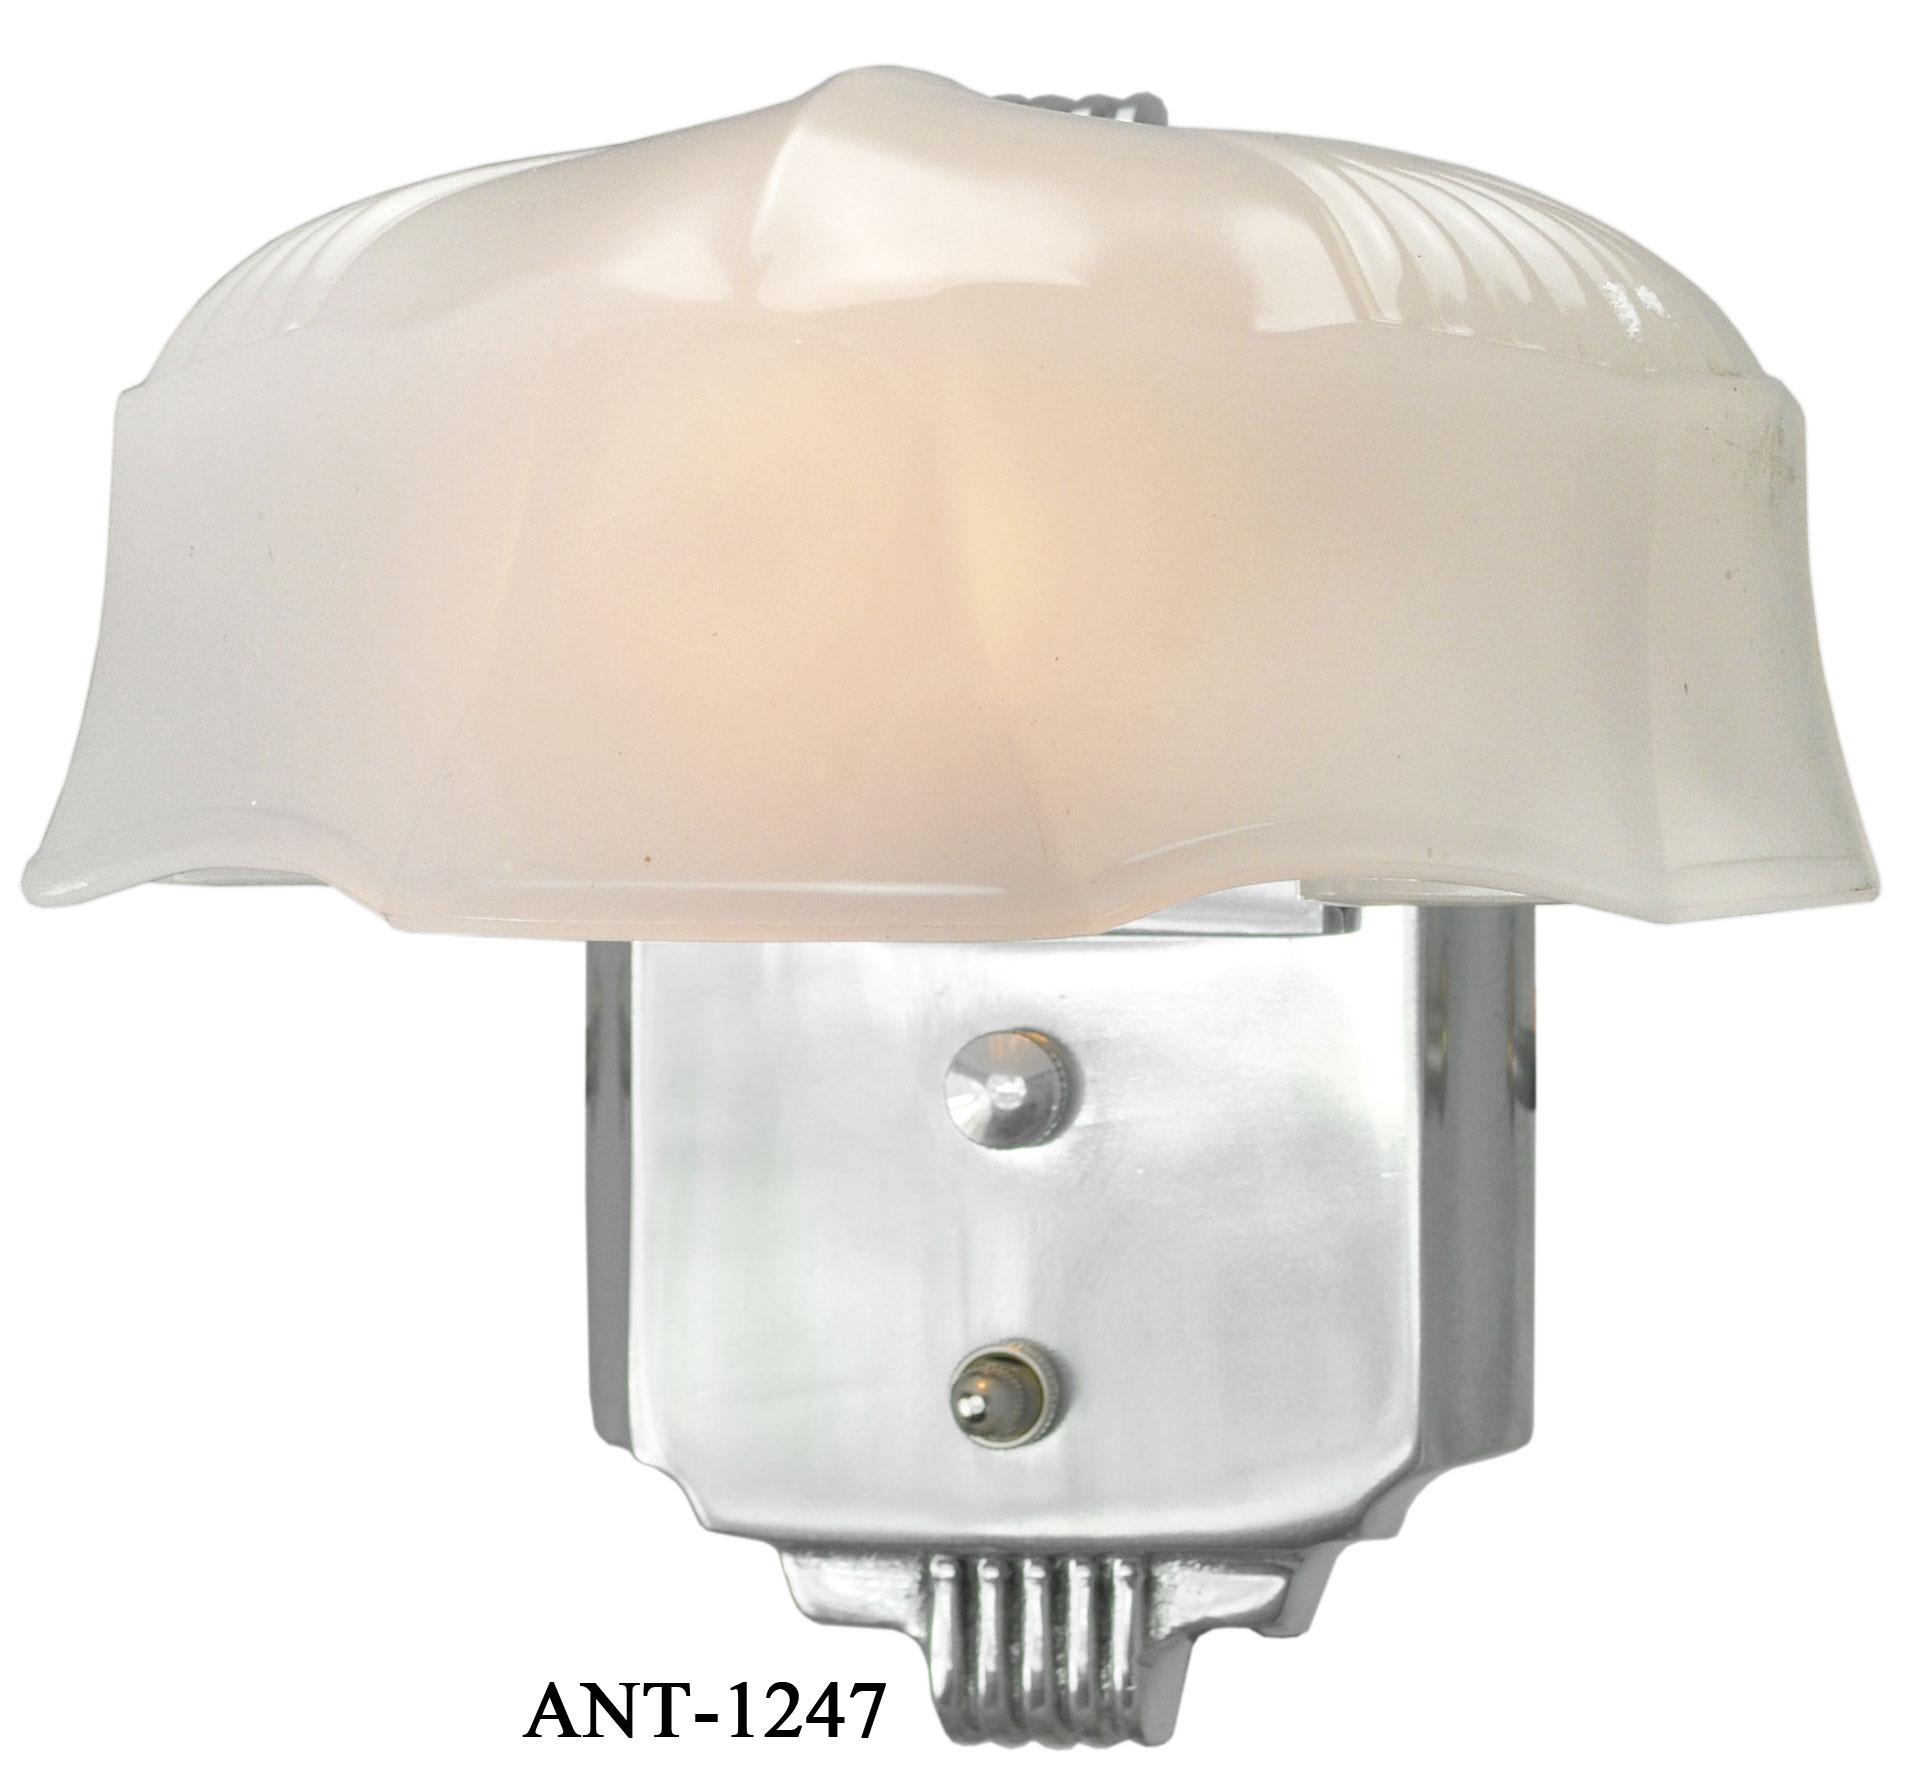 Vintage Hardware Lighting Art Deco Streamline Wall Sconce Light Fixture Ant 1247